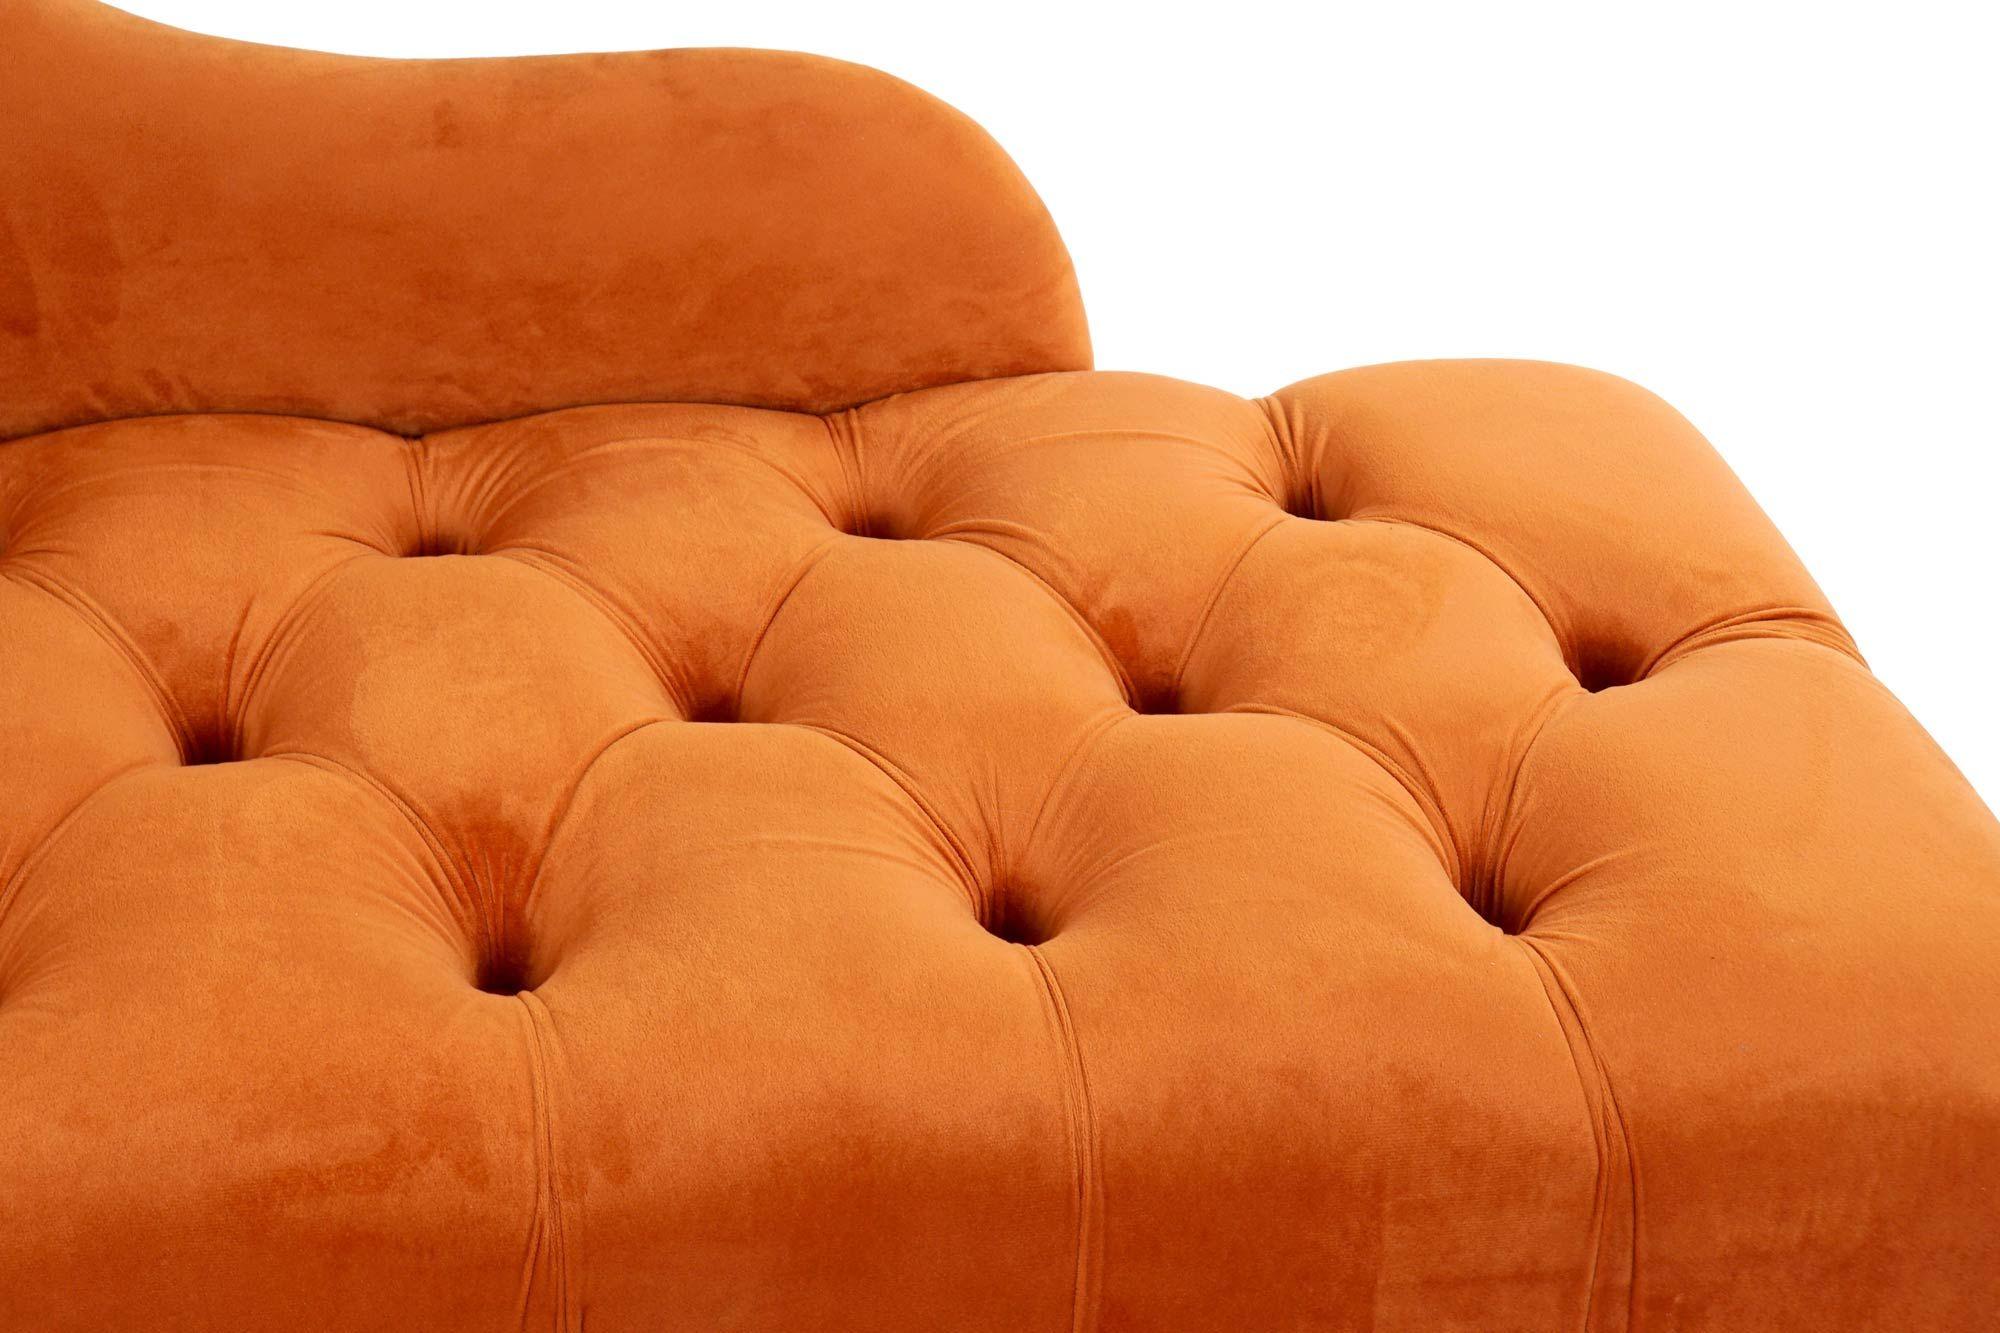 30091-chaiselongue-terciopelo-naranja-tostado-2.jpg